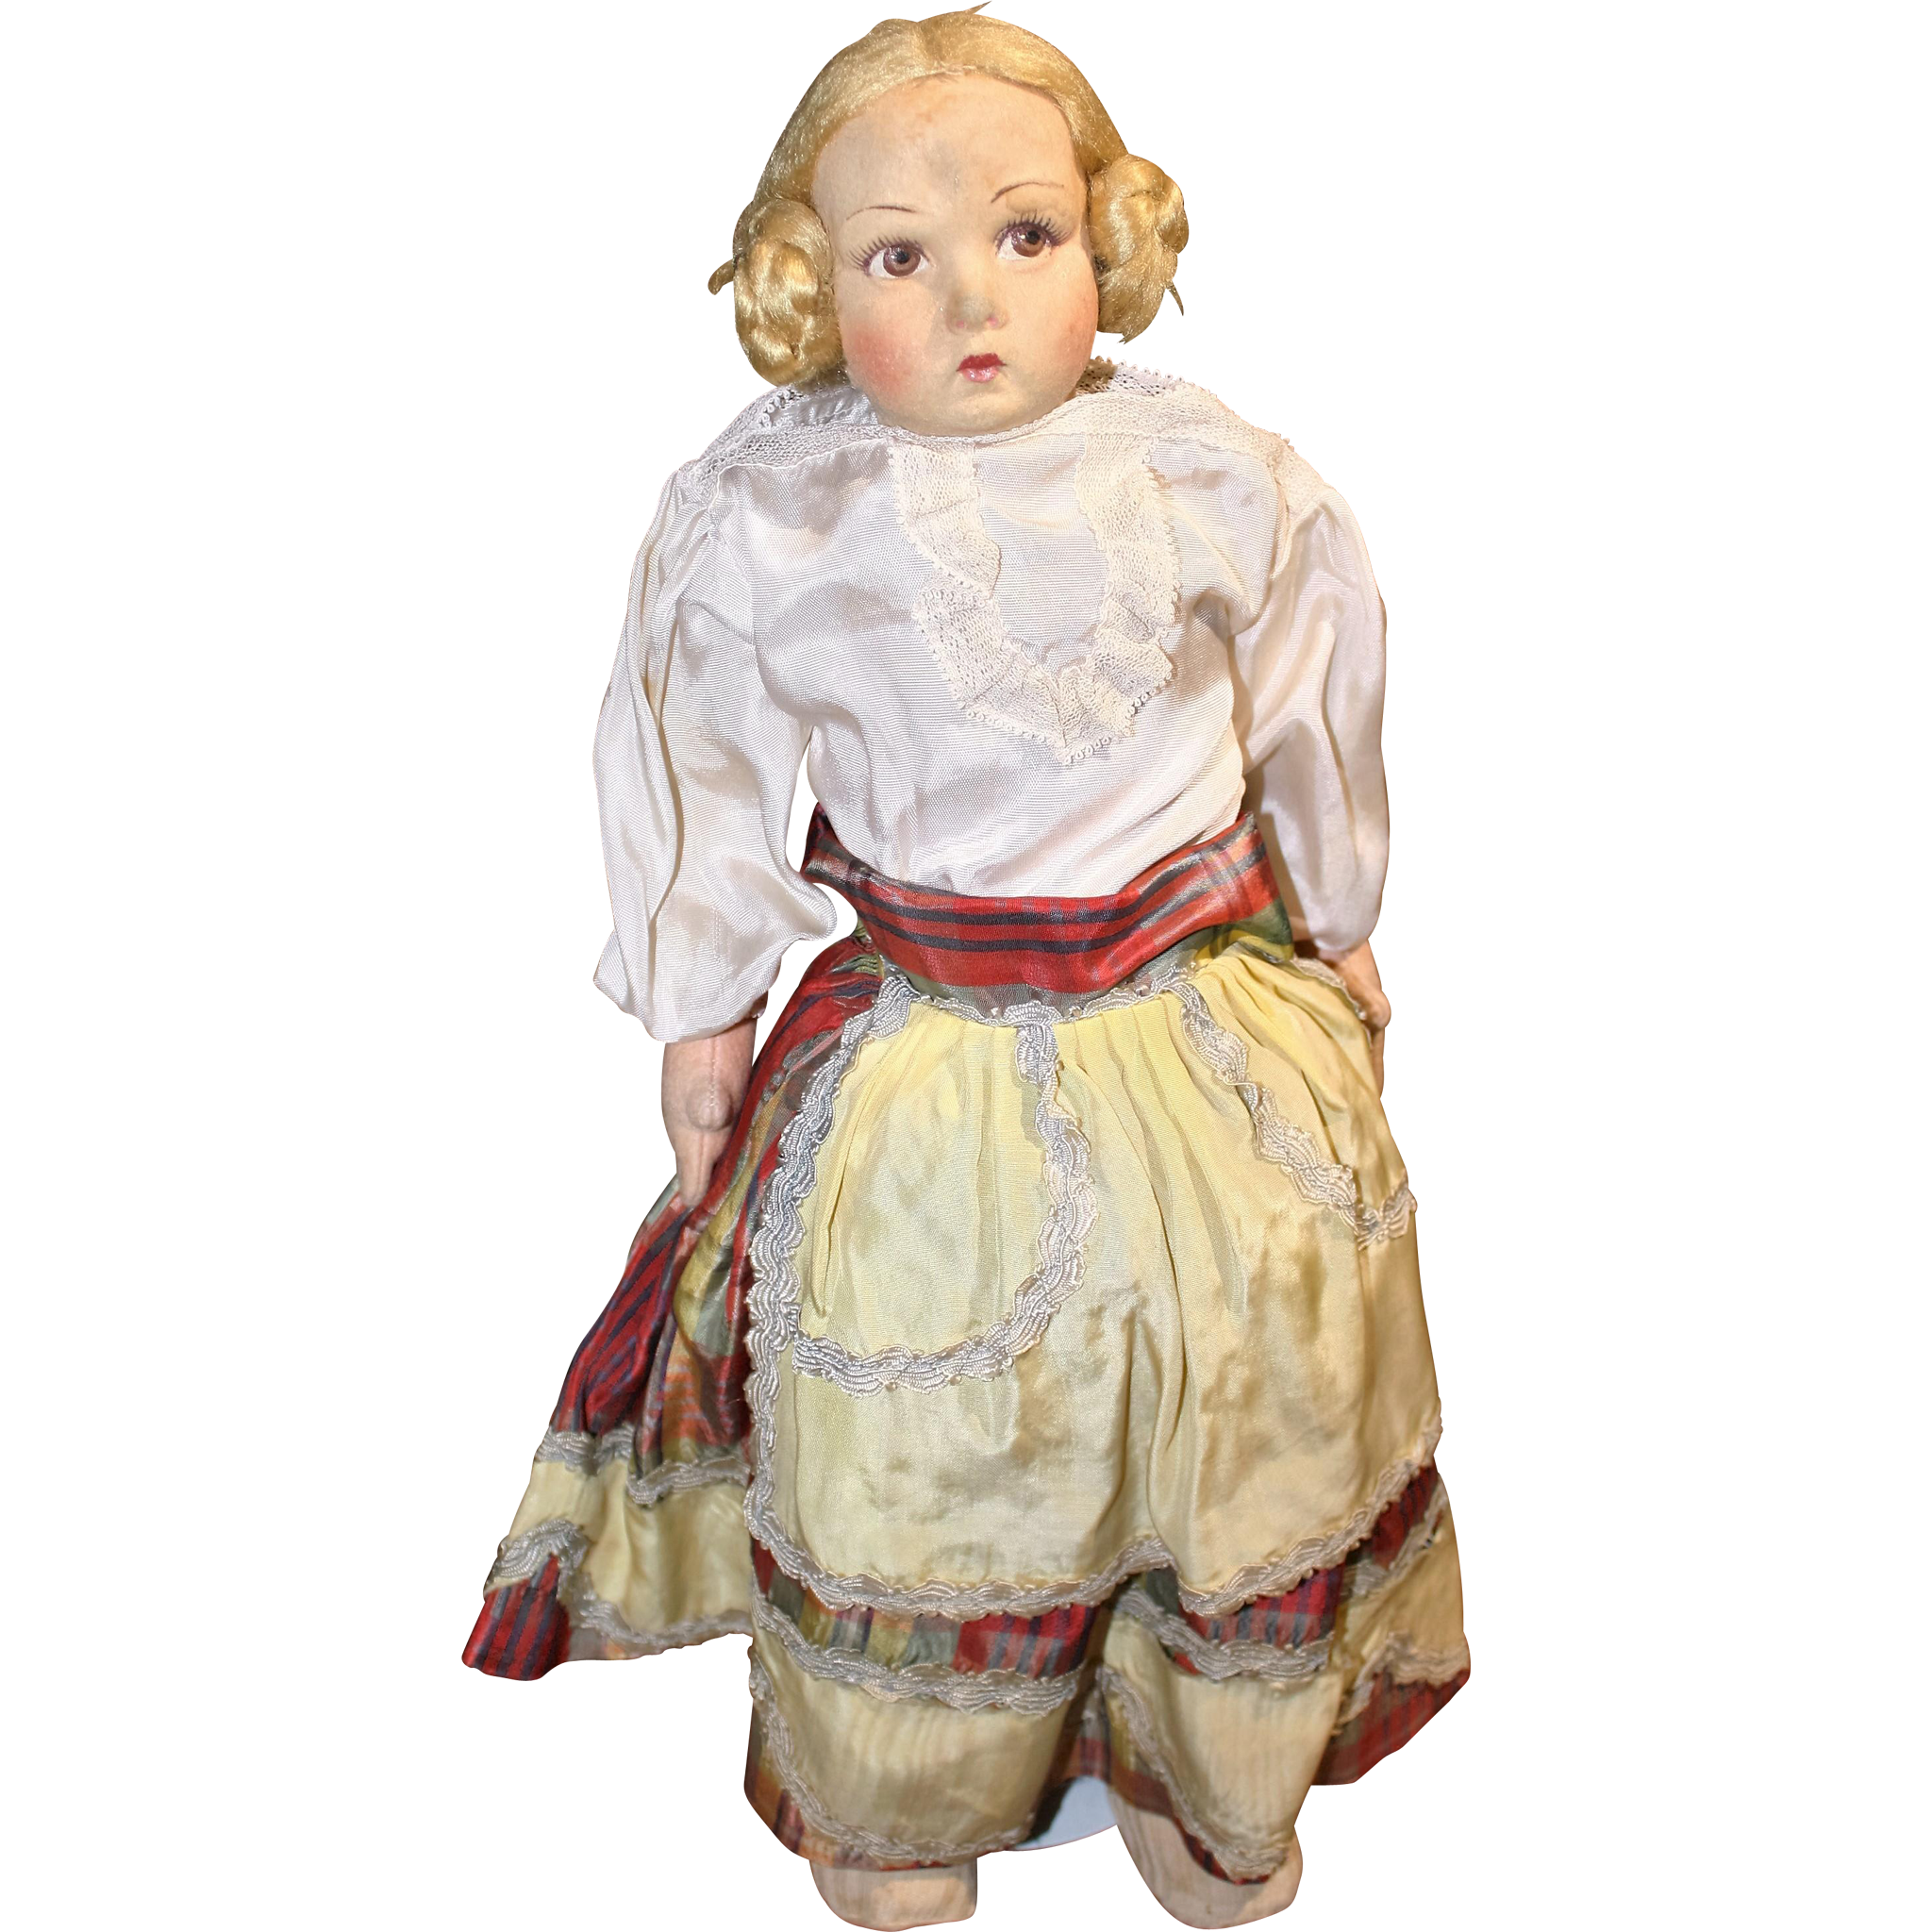 1920's-30's Lenci Type Vintage Felt cloth doll